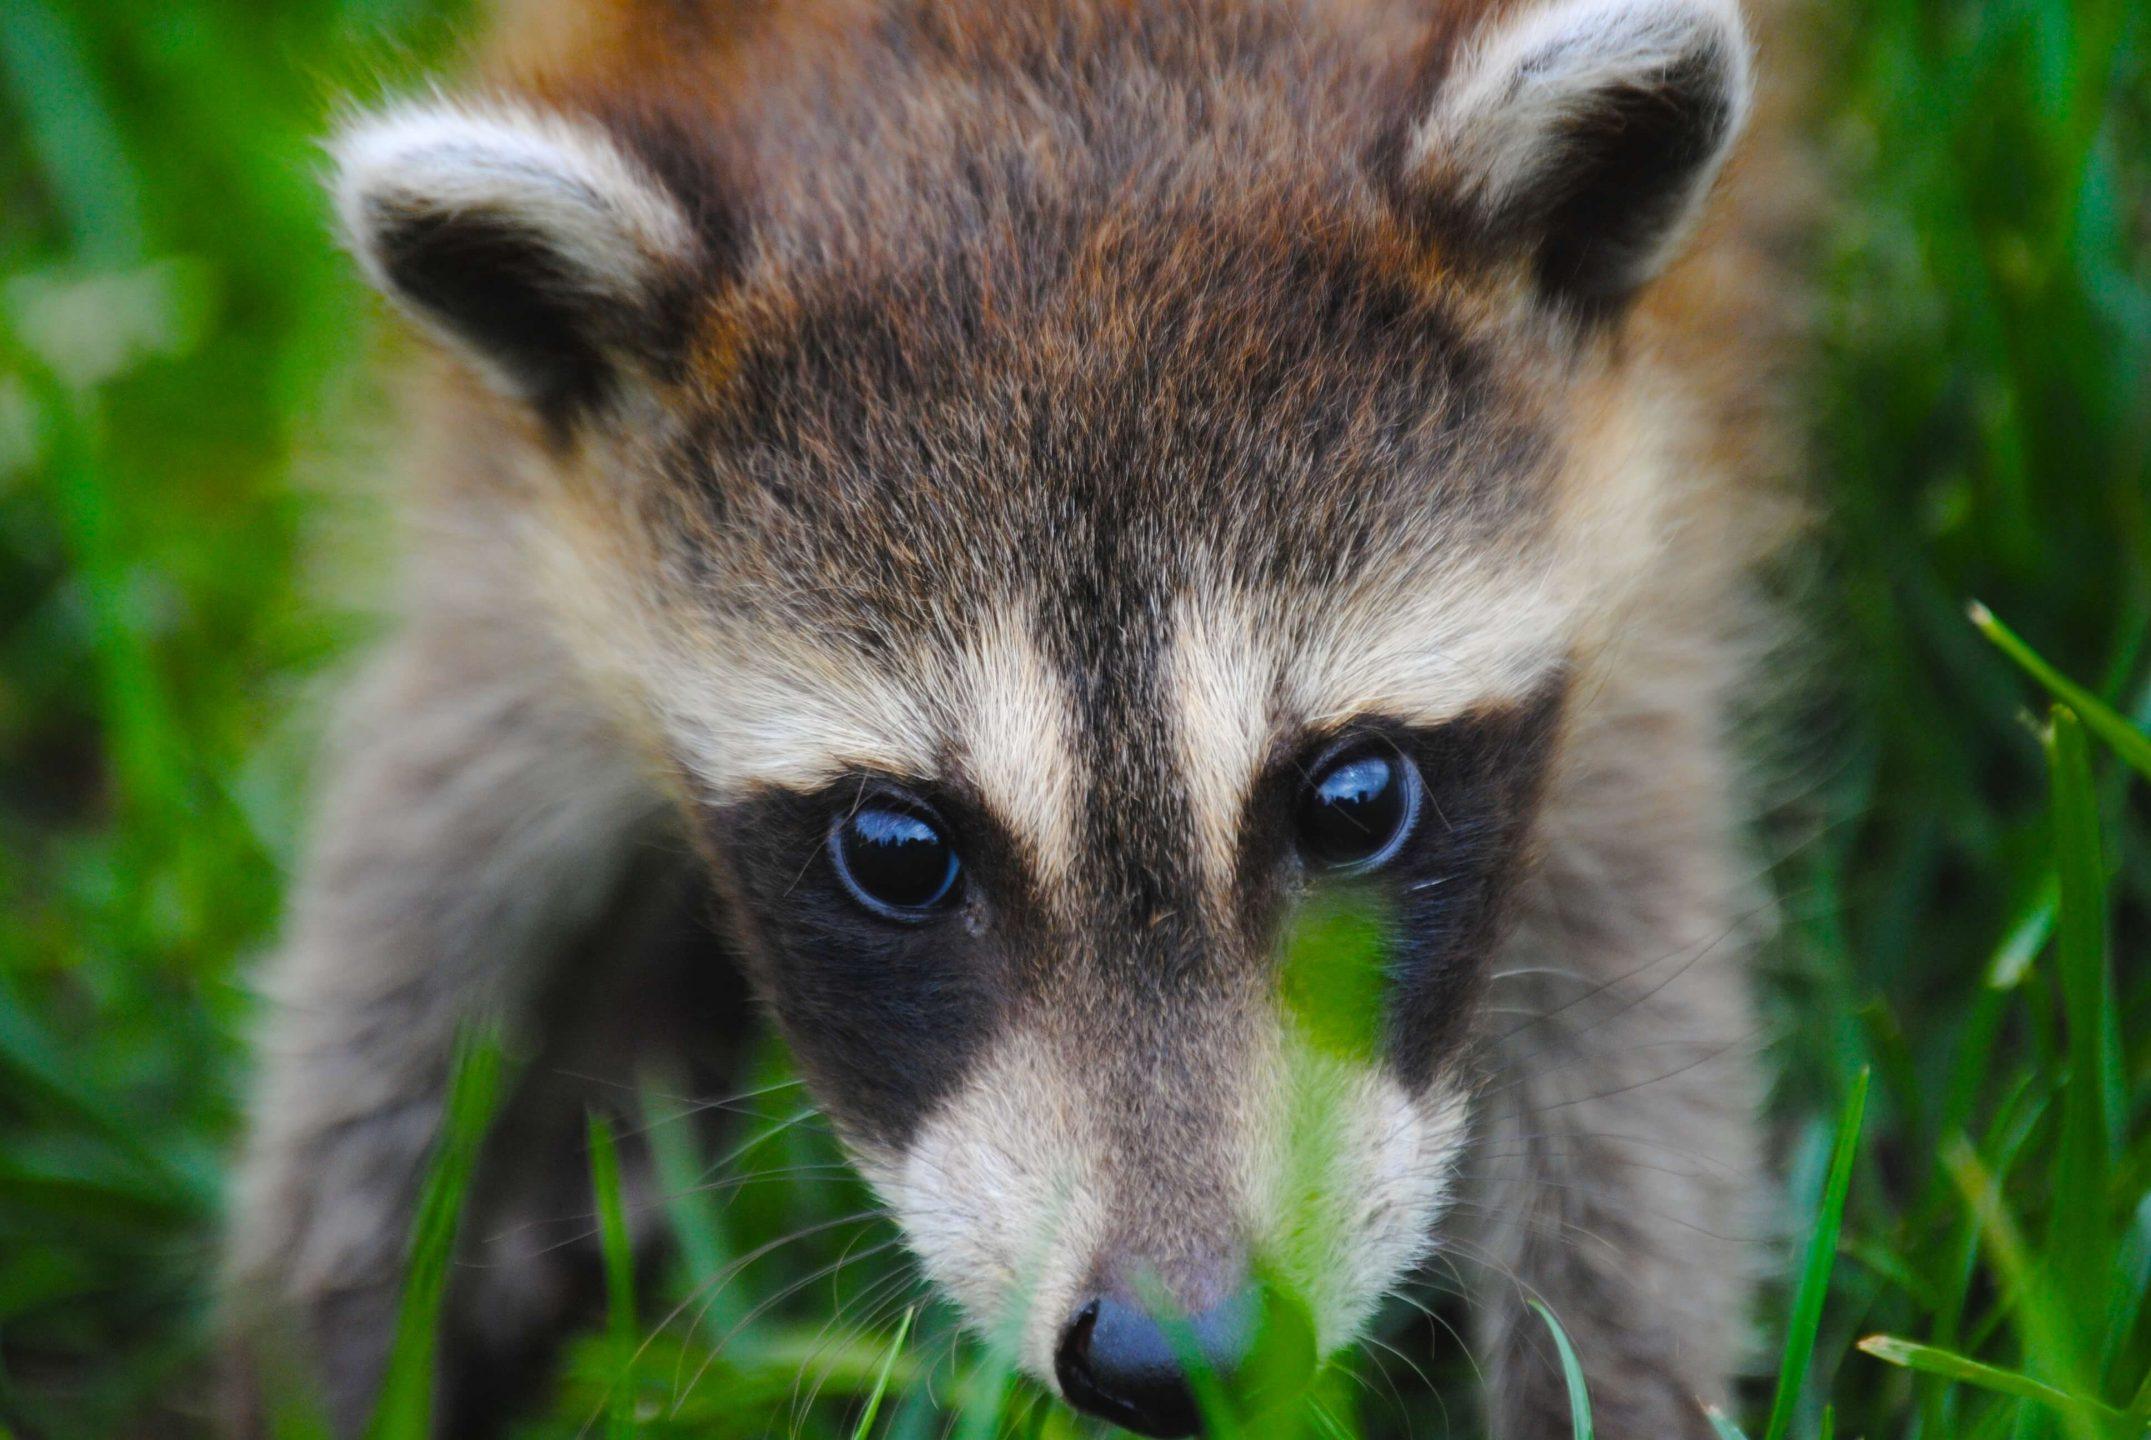 raccoon outside grass